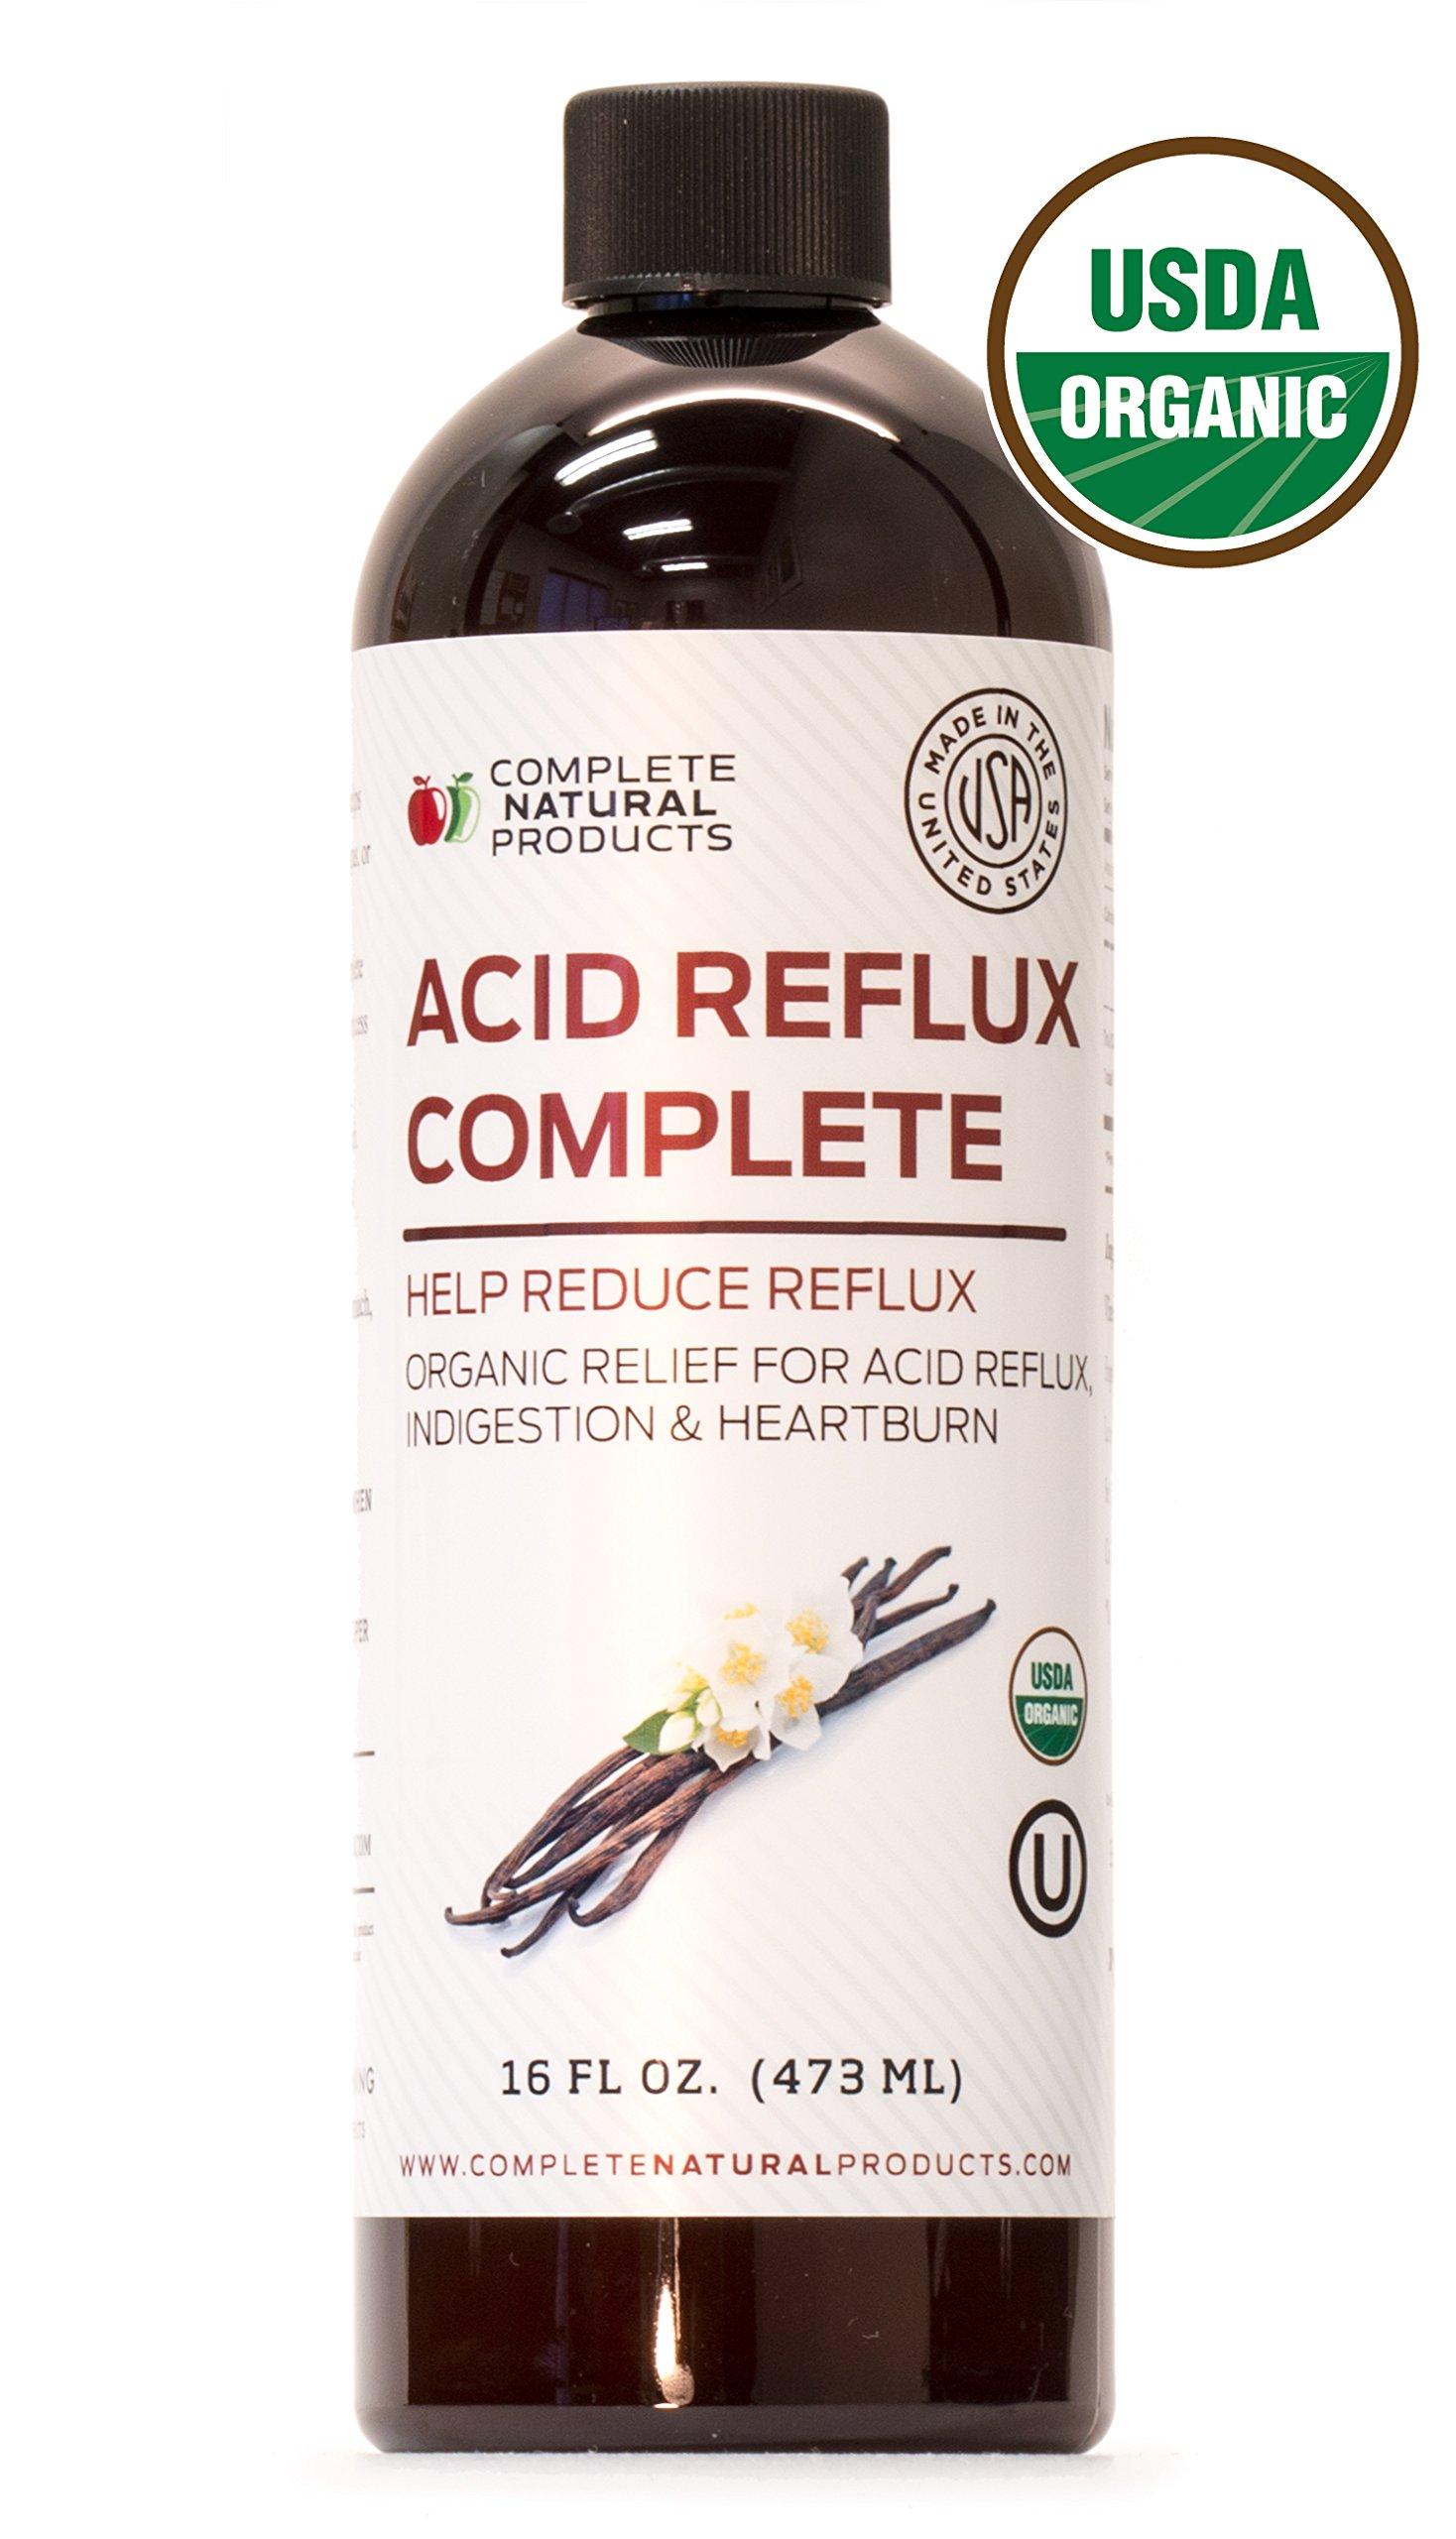 Acid Reflux Complete 16oz - Natural Organic Liquid Heartburn, GERD, Amish Reflux Relief Remedy & Medicine